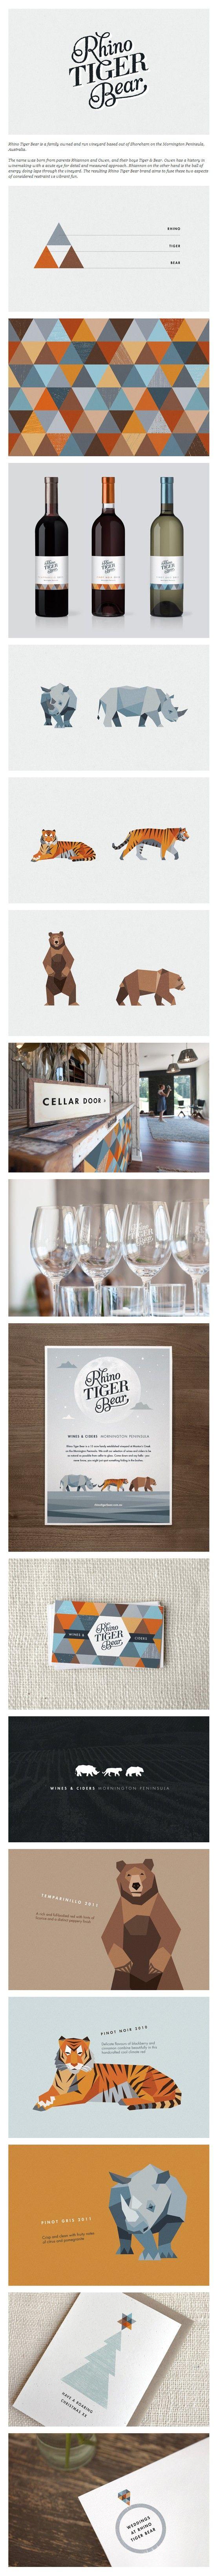 Rhino Tiger Bear #identity #packaging #branding #marketing PD